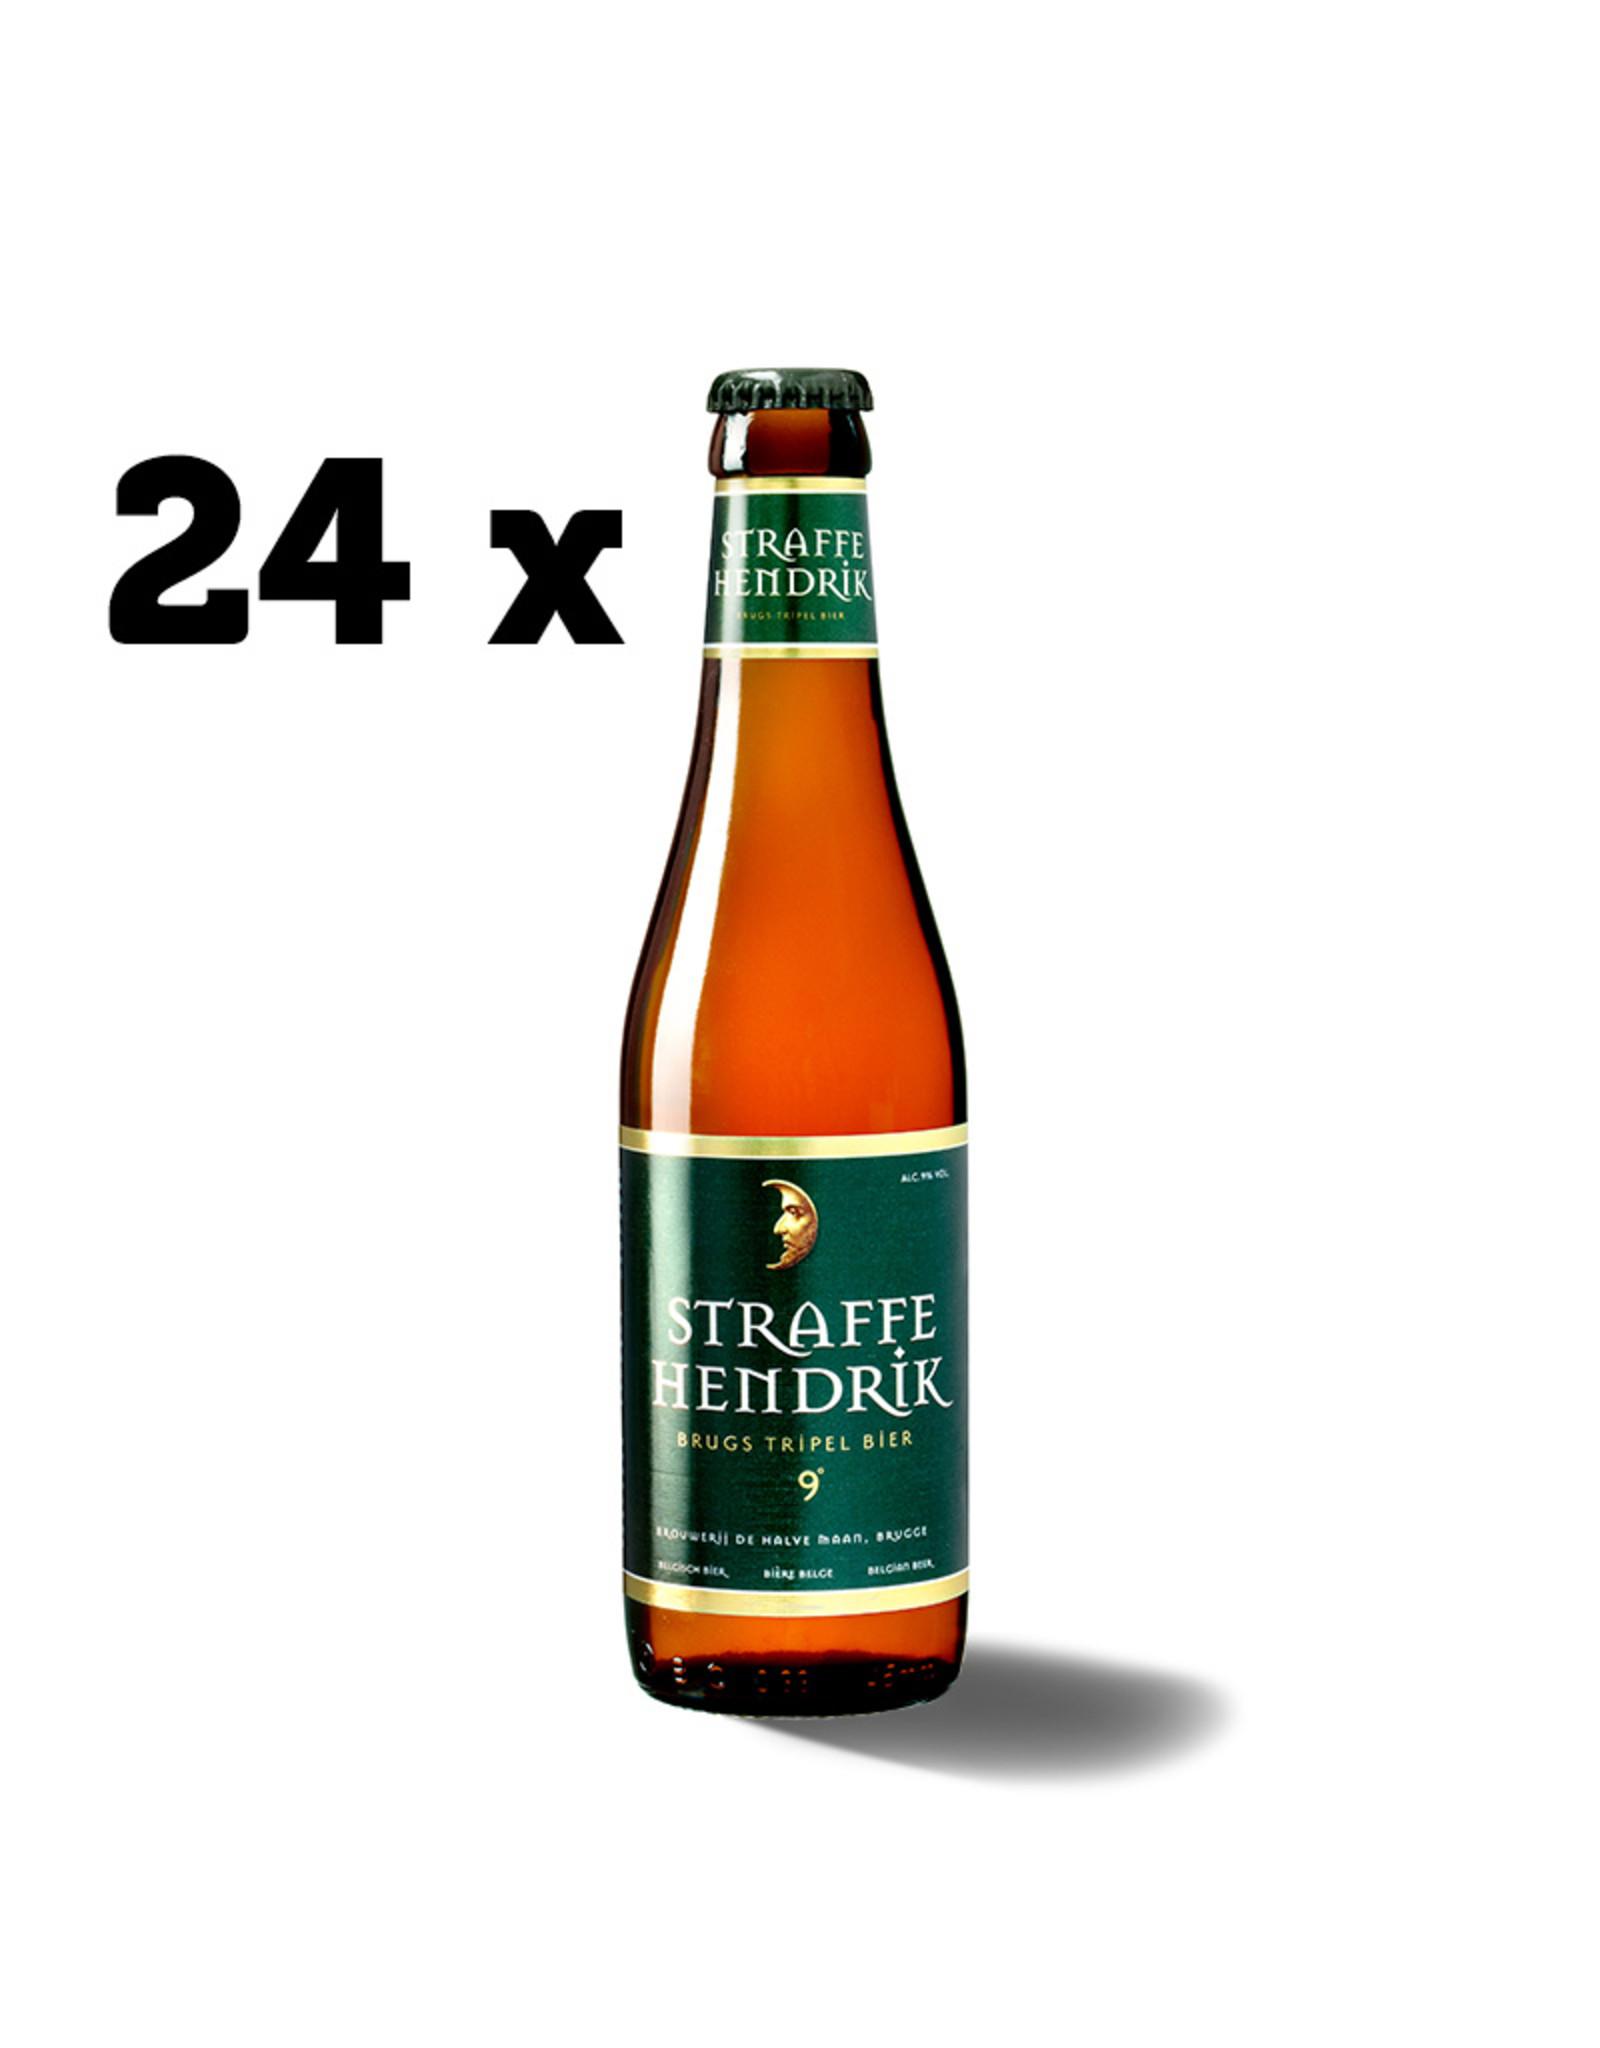 Straffe Hendrik Straffe Hendrik Tripel Bak 24 X 33 cl